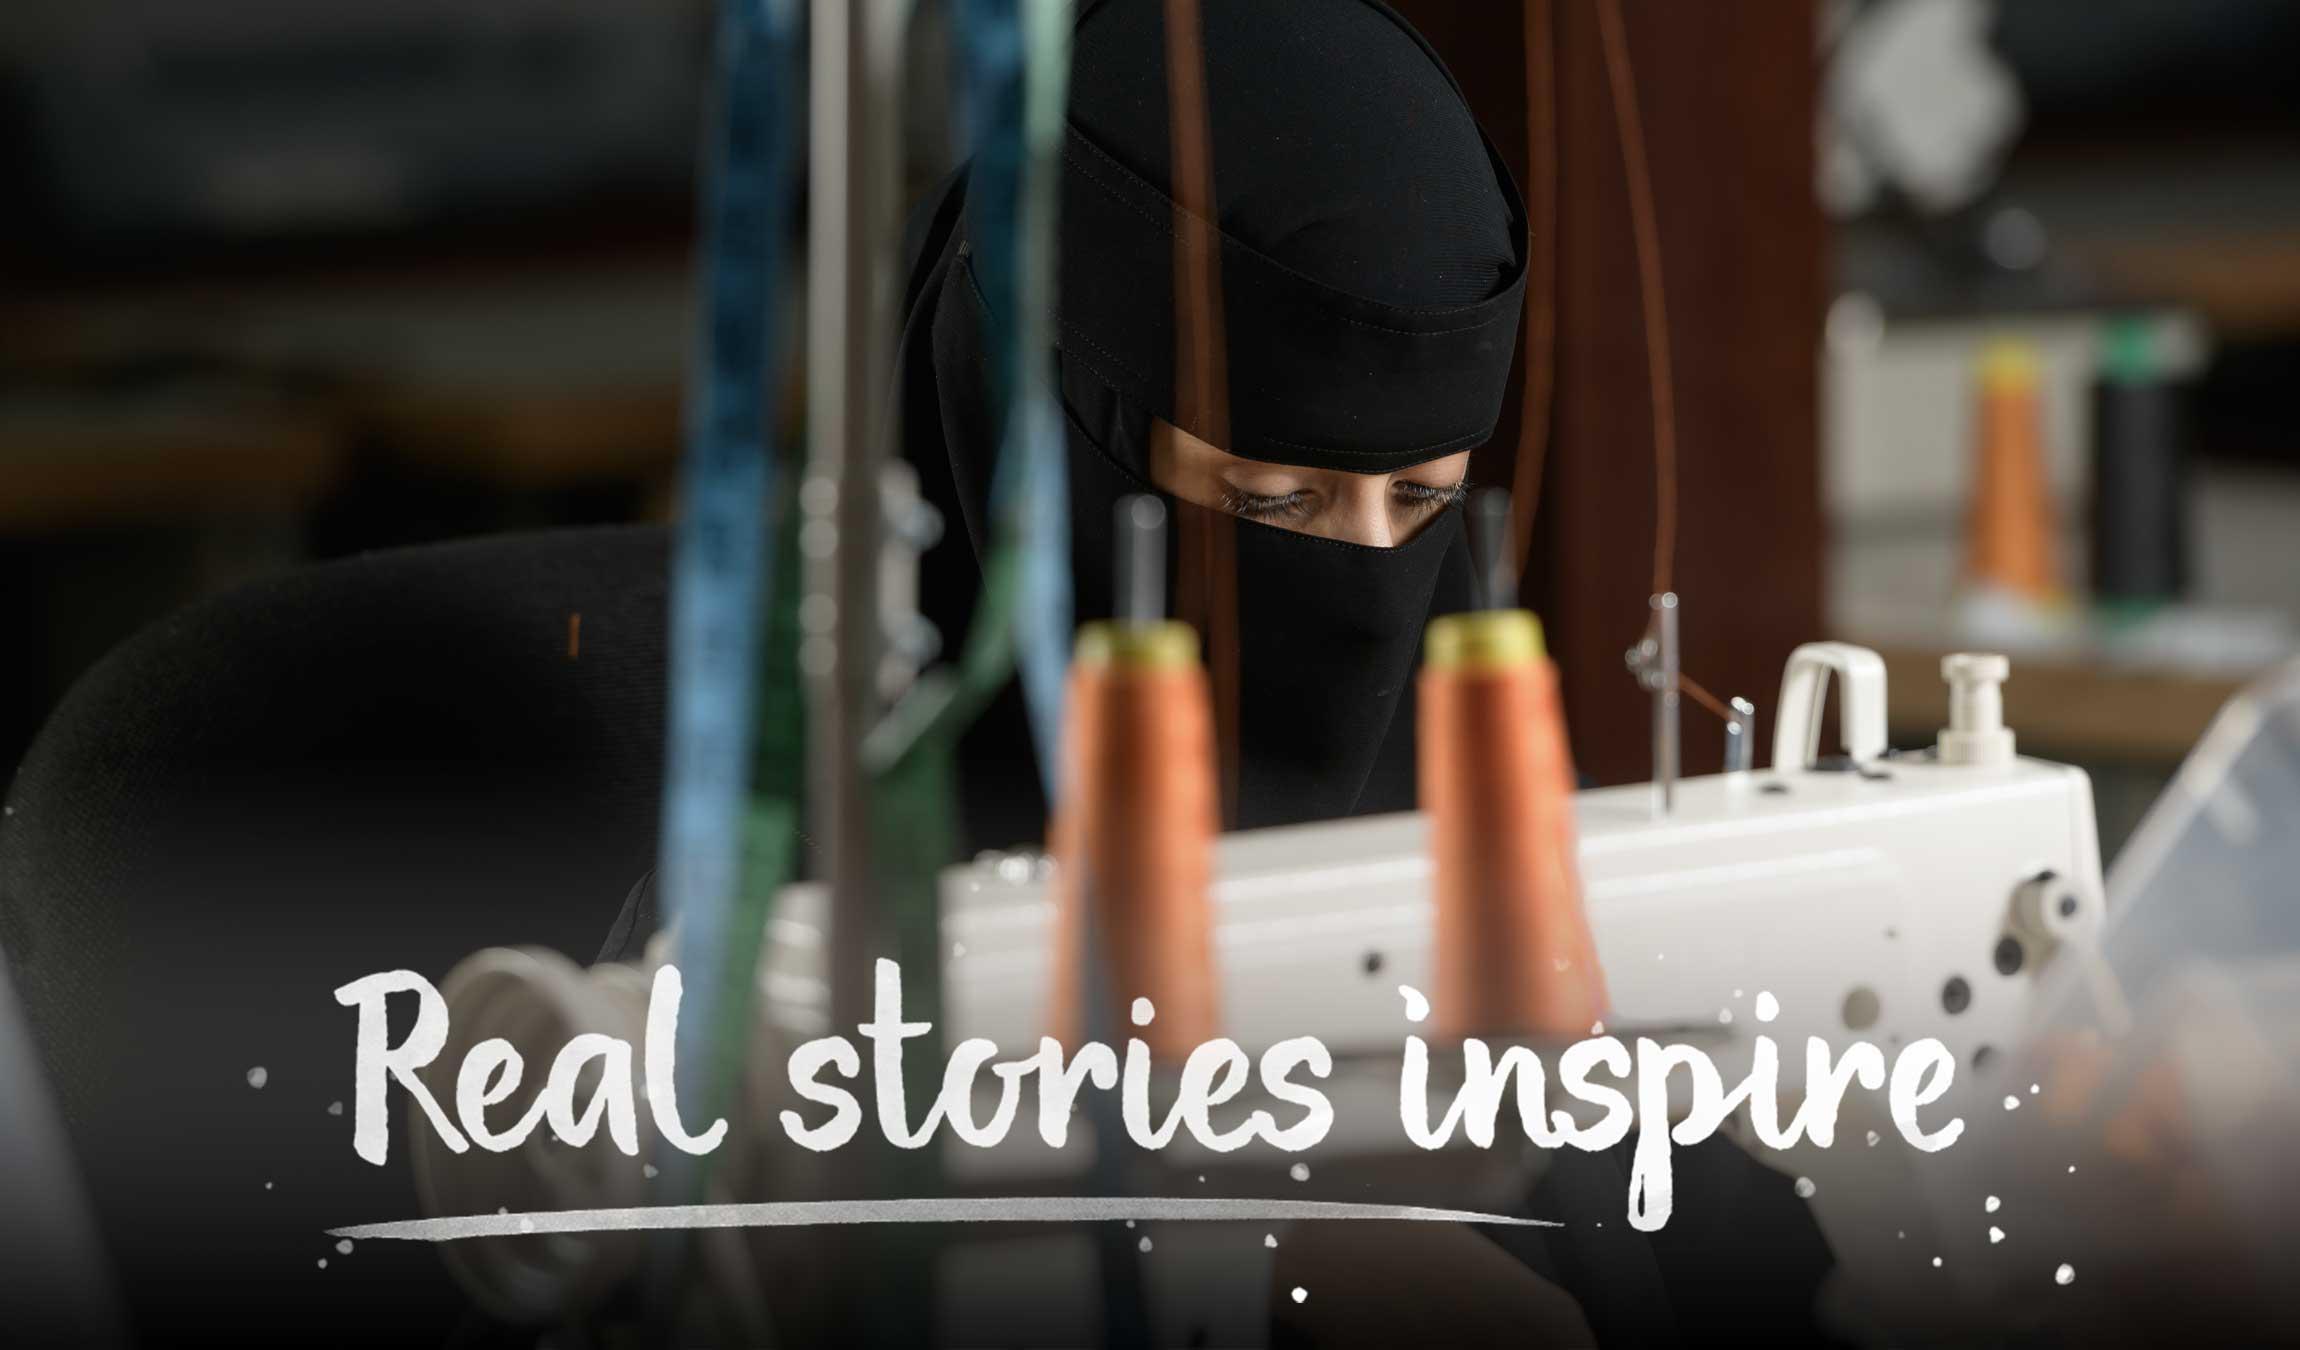 Real stories inspire - An indomitable spirit